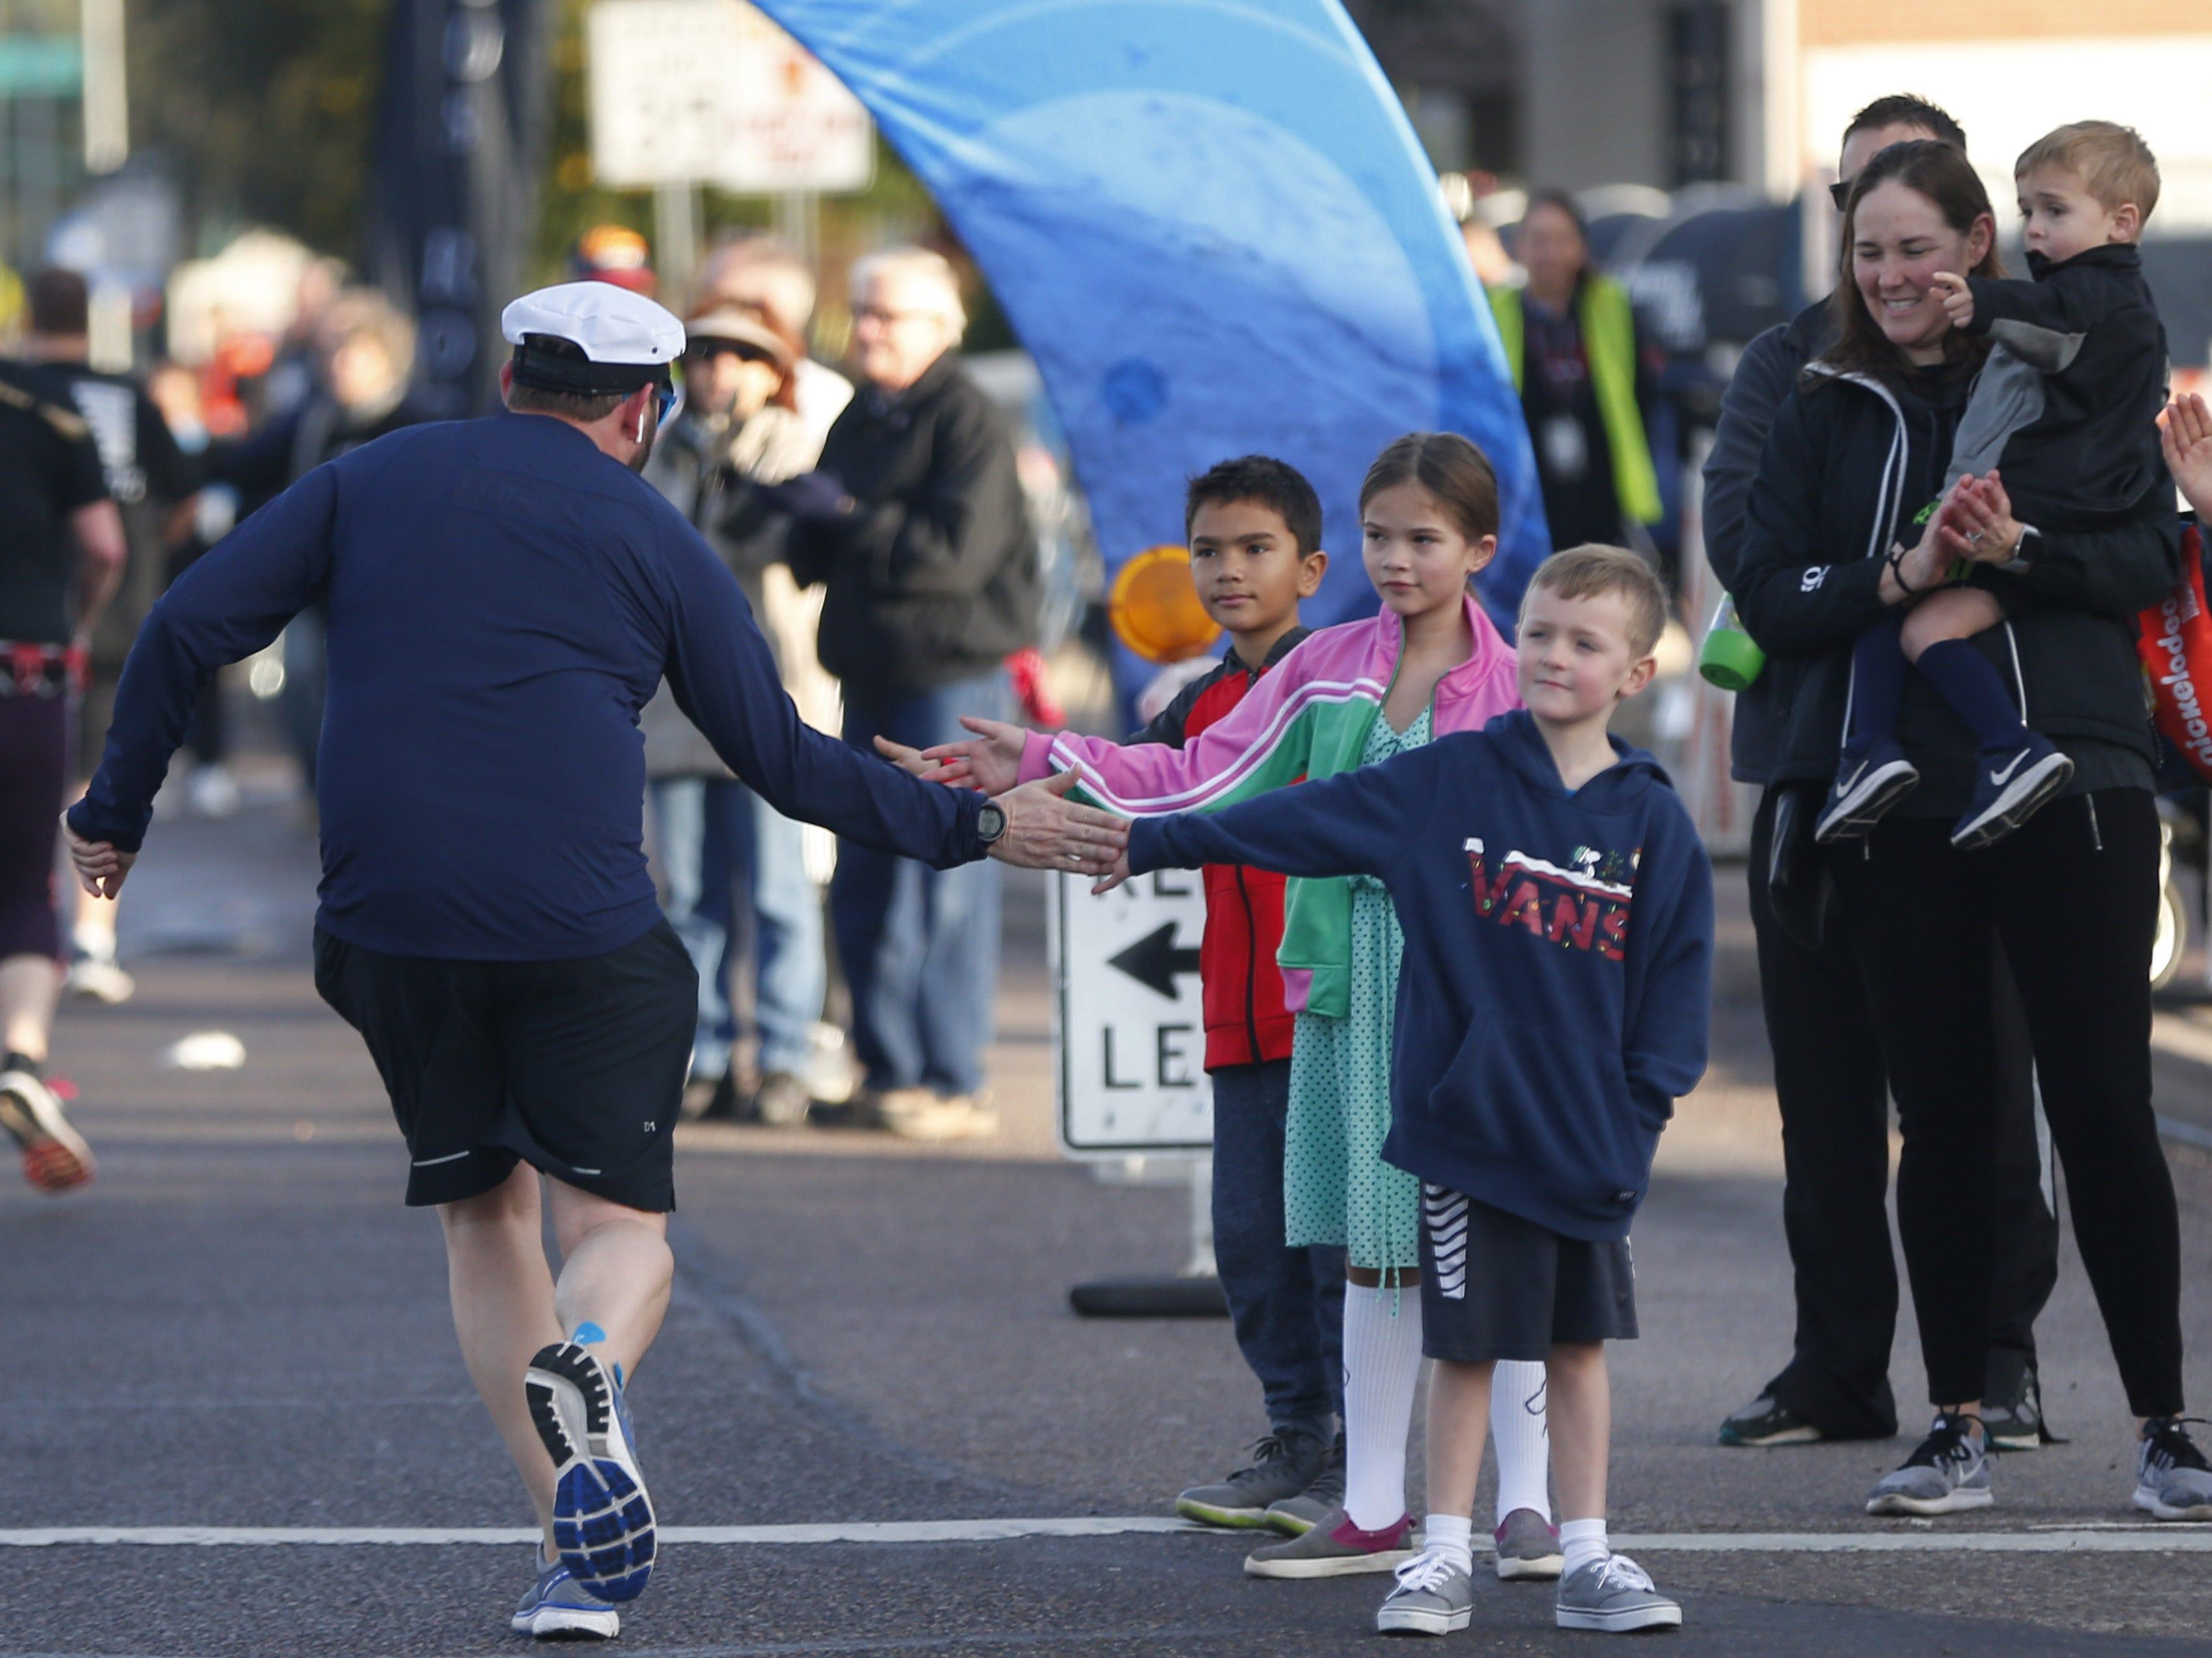 Spectators greet runners on 7th Ave. during the Rock 'n' Roll Marathon in Phoenix, Jan. 20, 2019.